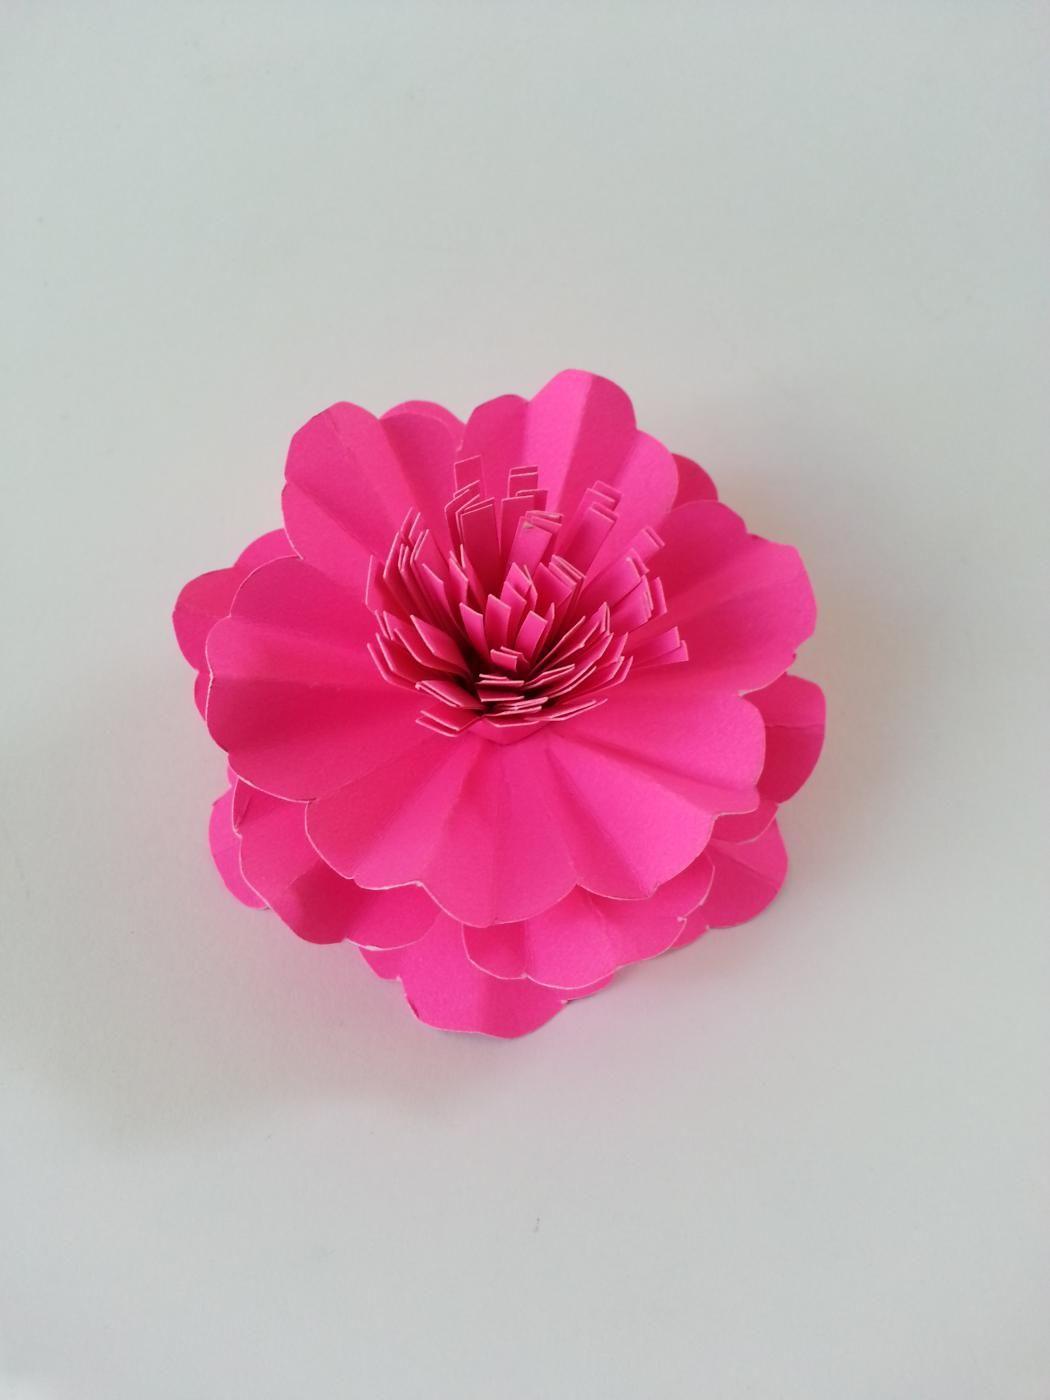 Diy paper carnation flower diy flowers bows ideas pinterest diy paper carnation flower mightylinksfo